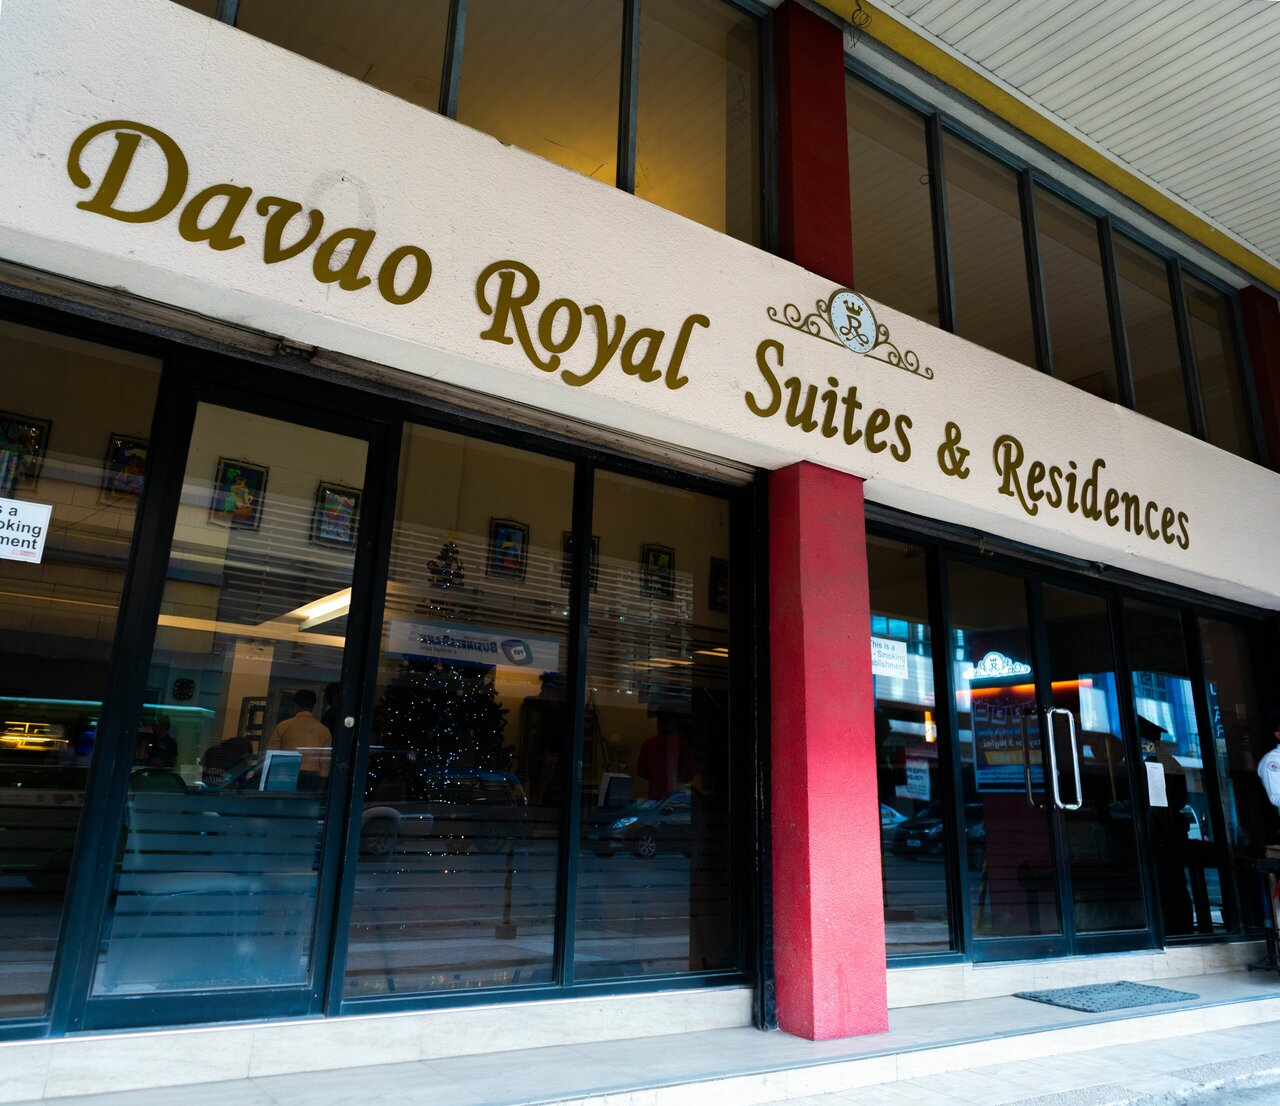 The Royale House Travel Inn & Suites